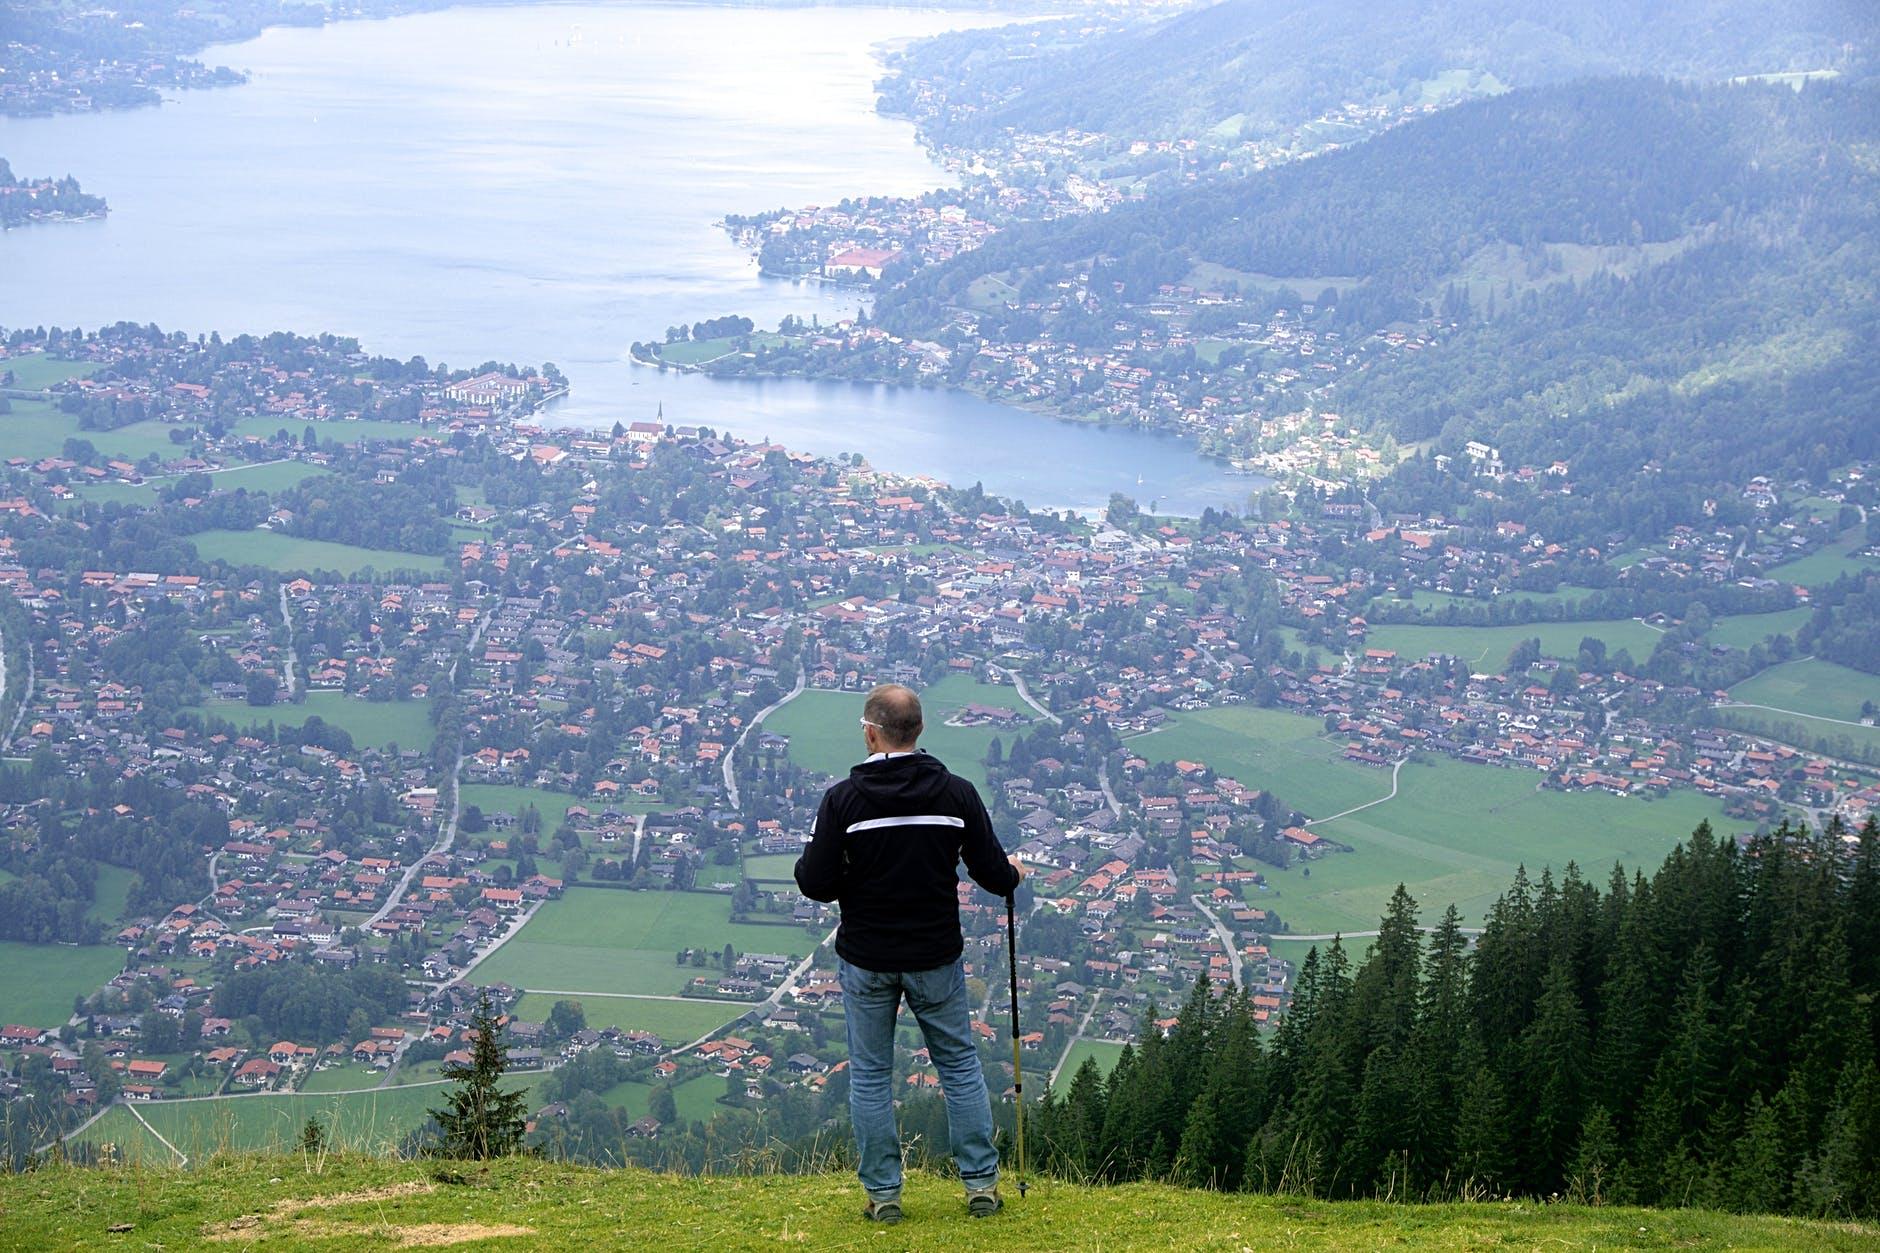 man person mountain hiker